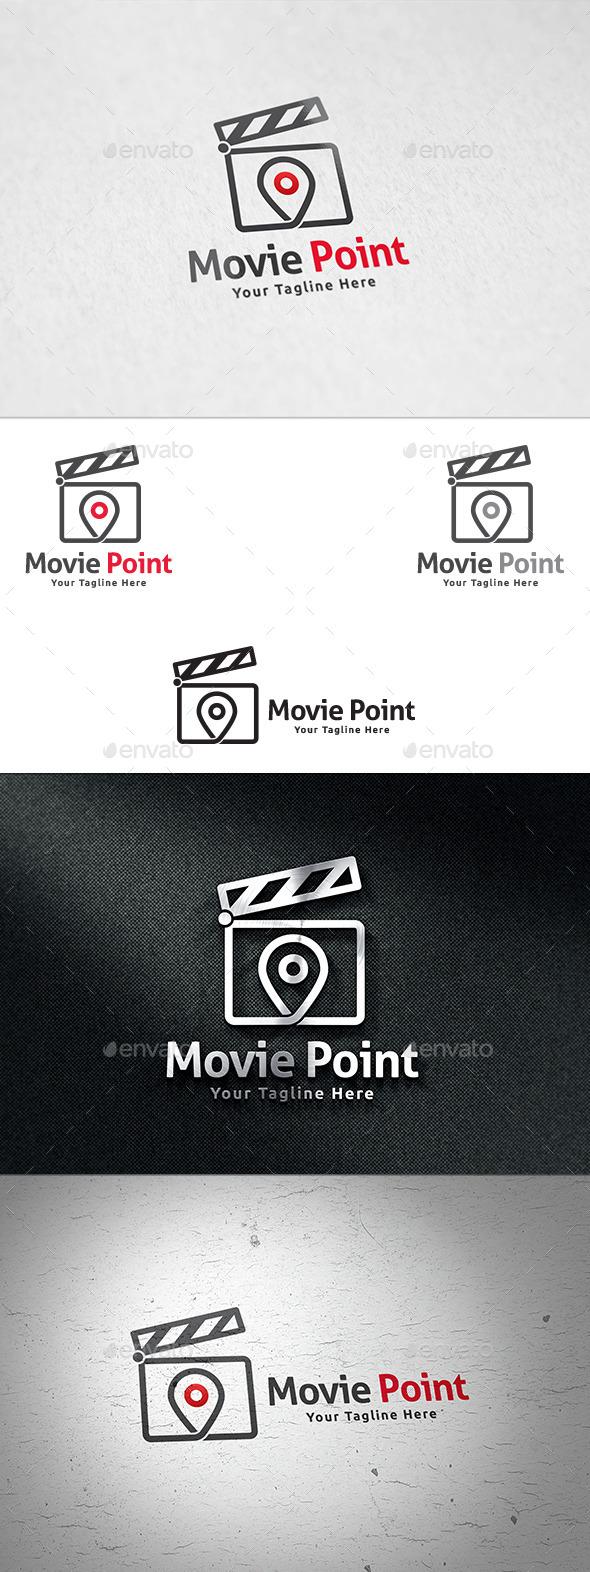 Movie Point - Logo Template